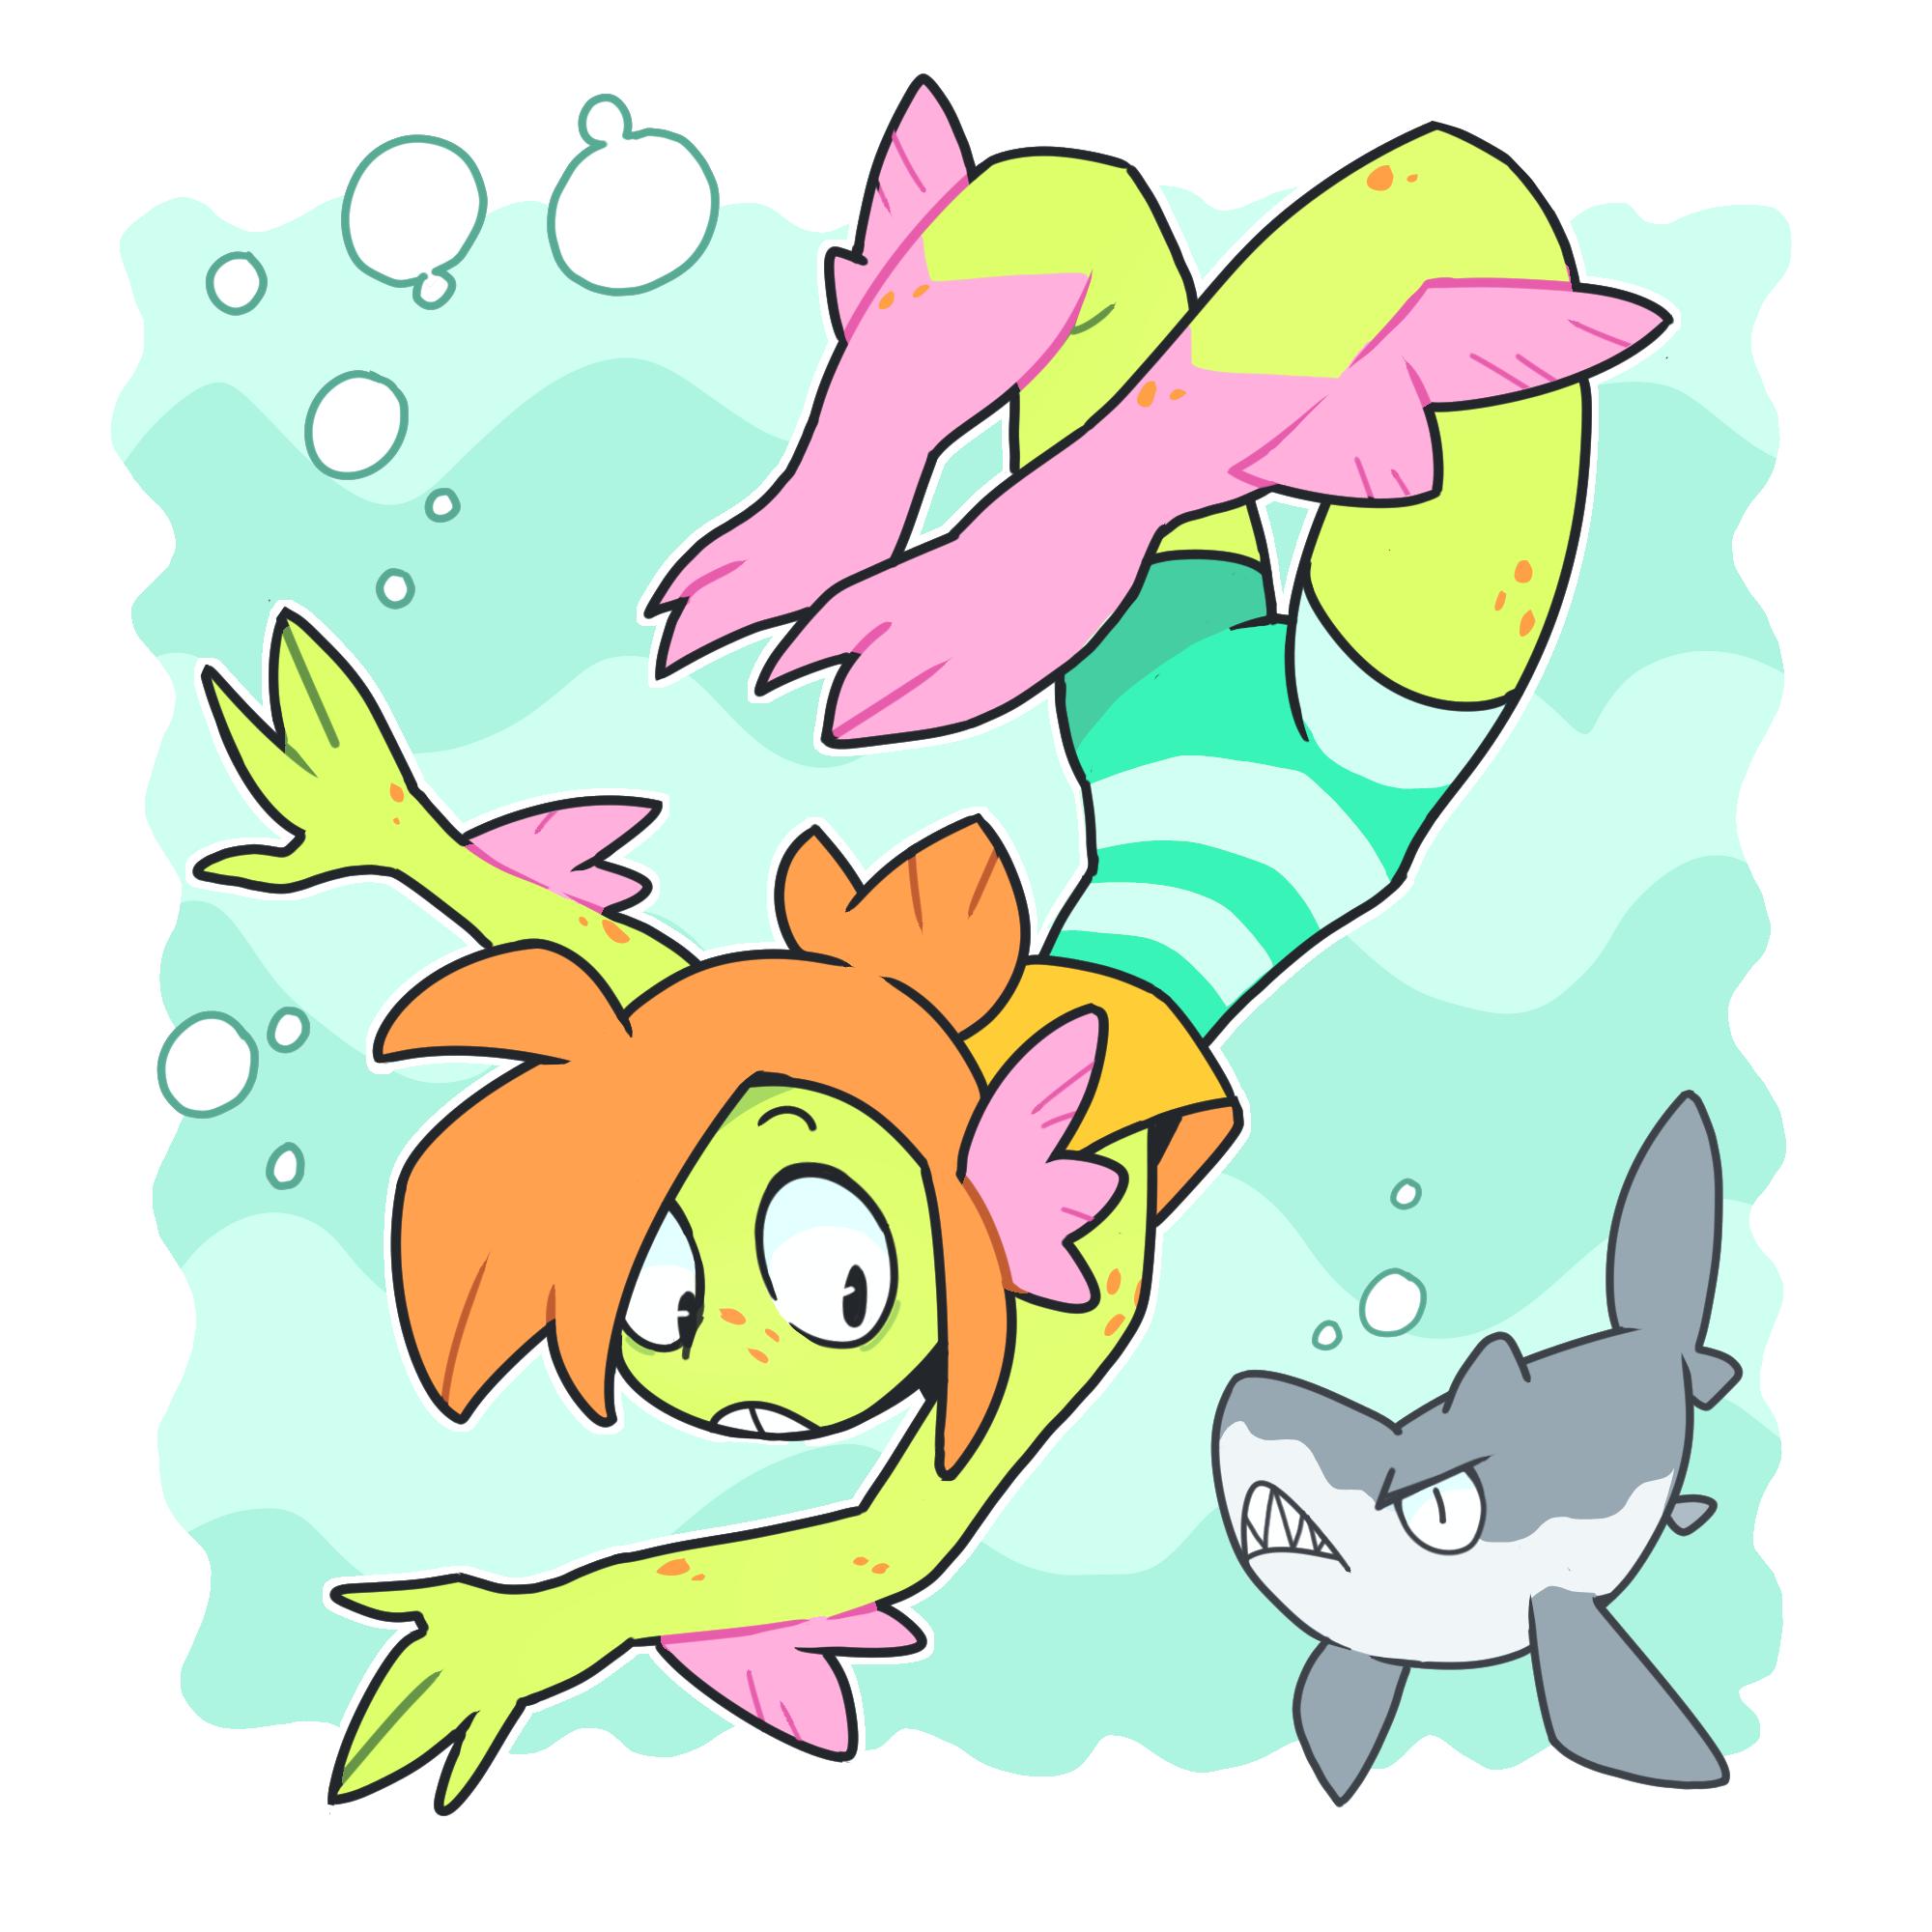 Pris & Shark